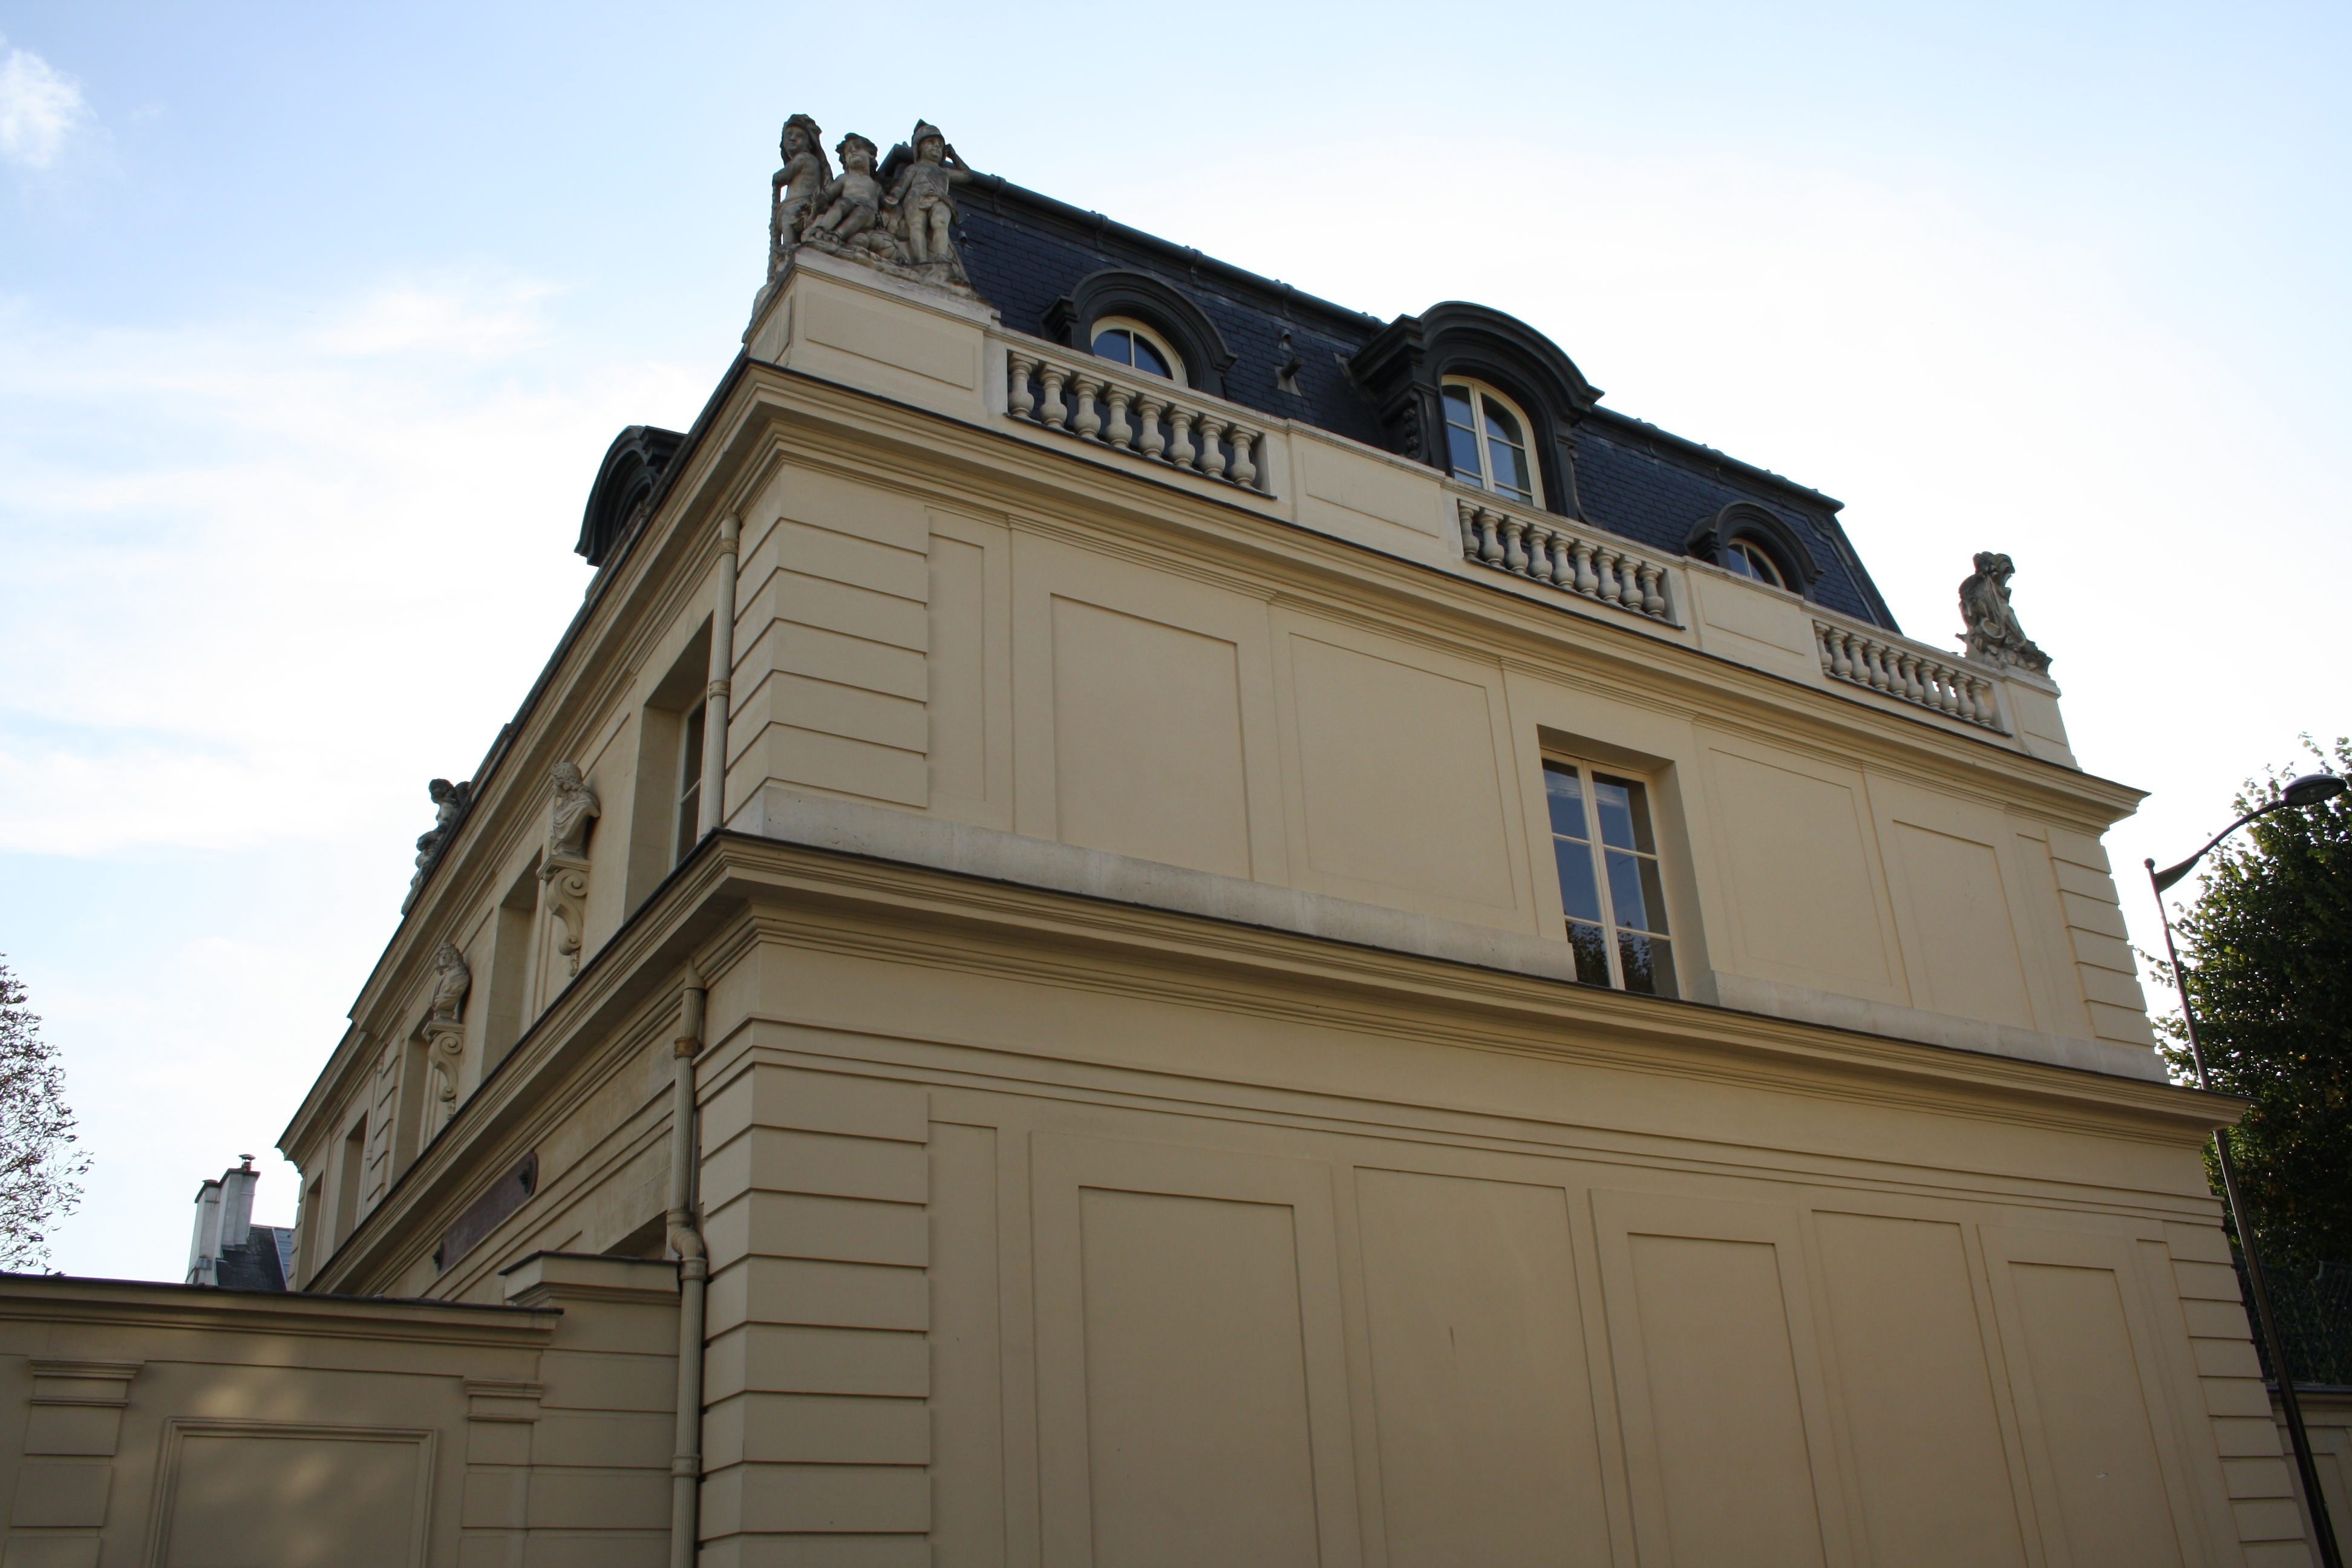 Home St Germain En Laye file:saint-germain-en-laye hôtel de noailles 2011 08